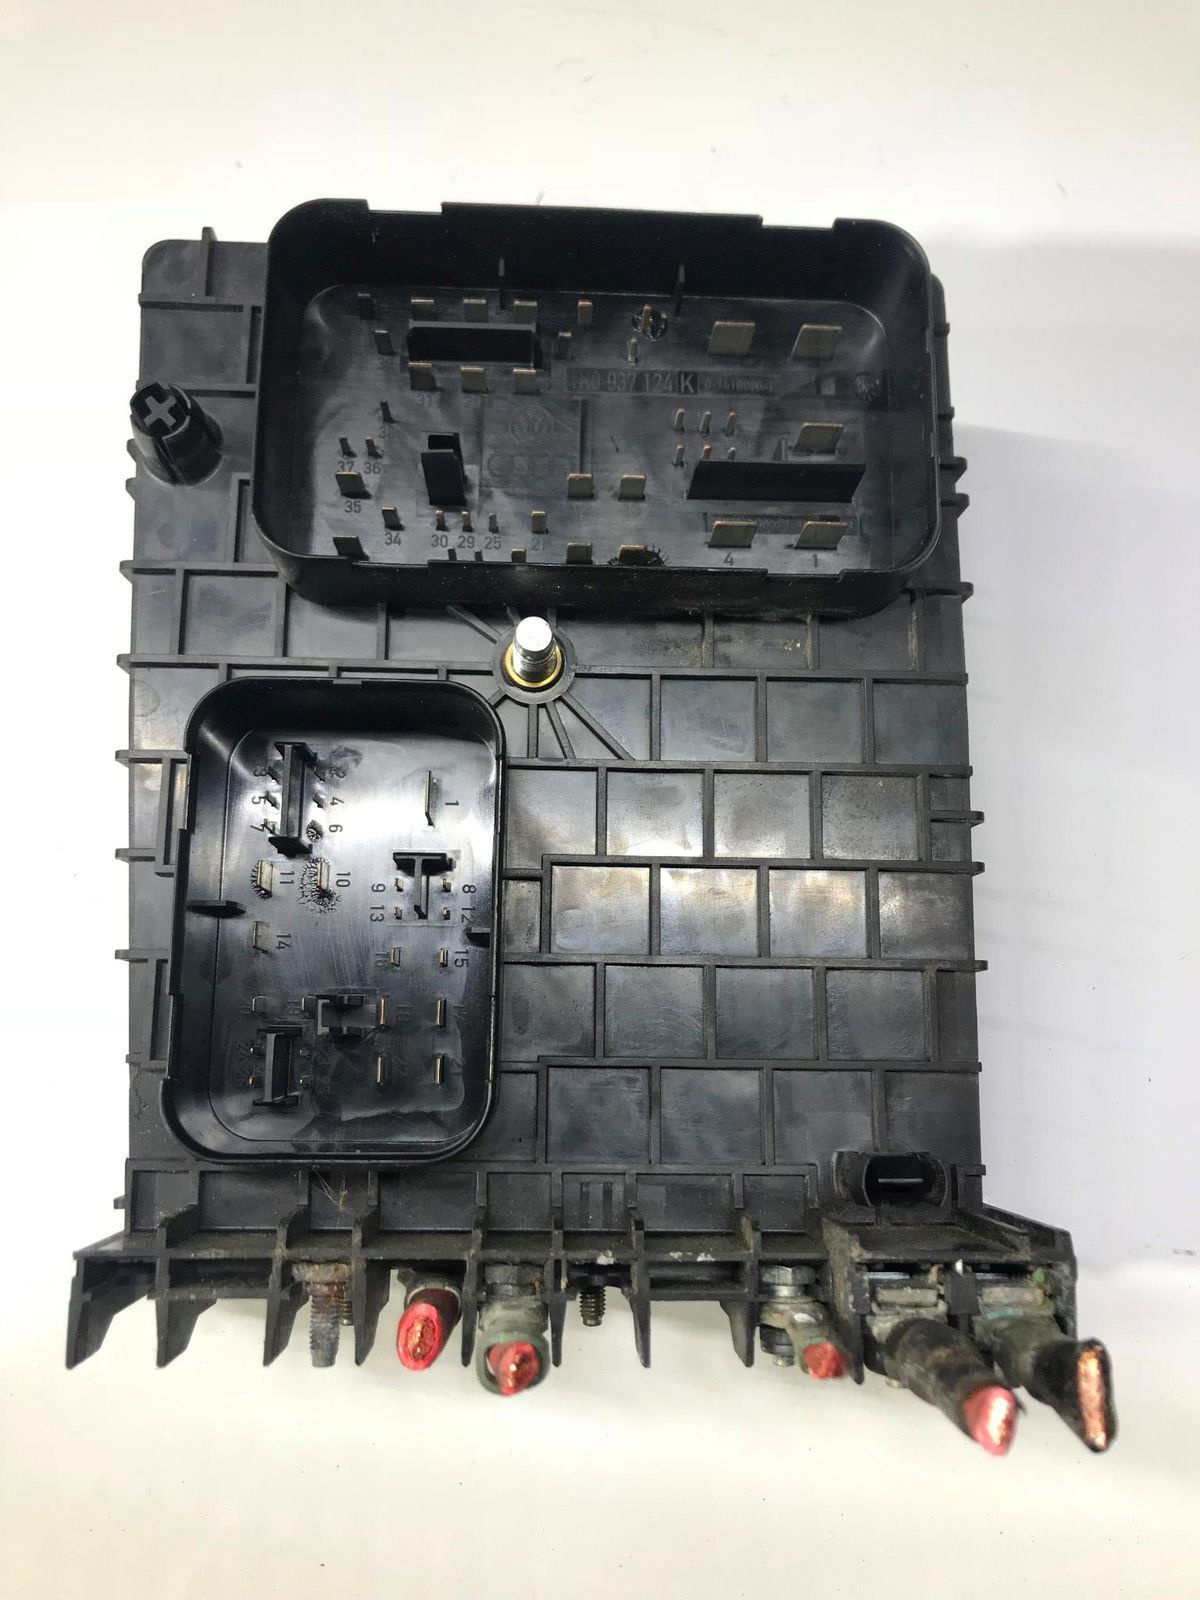 [DIAGRAM_5NL]  SV_2593] Nissan B12 Fuse Box Free Diagram | Nissan B12 Fuse Box |  | Nect Dupl Ynthe Rally Aesth Oper Vira Mohammedshrine Librar Wiring 101